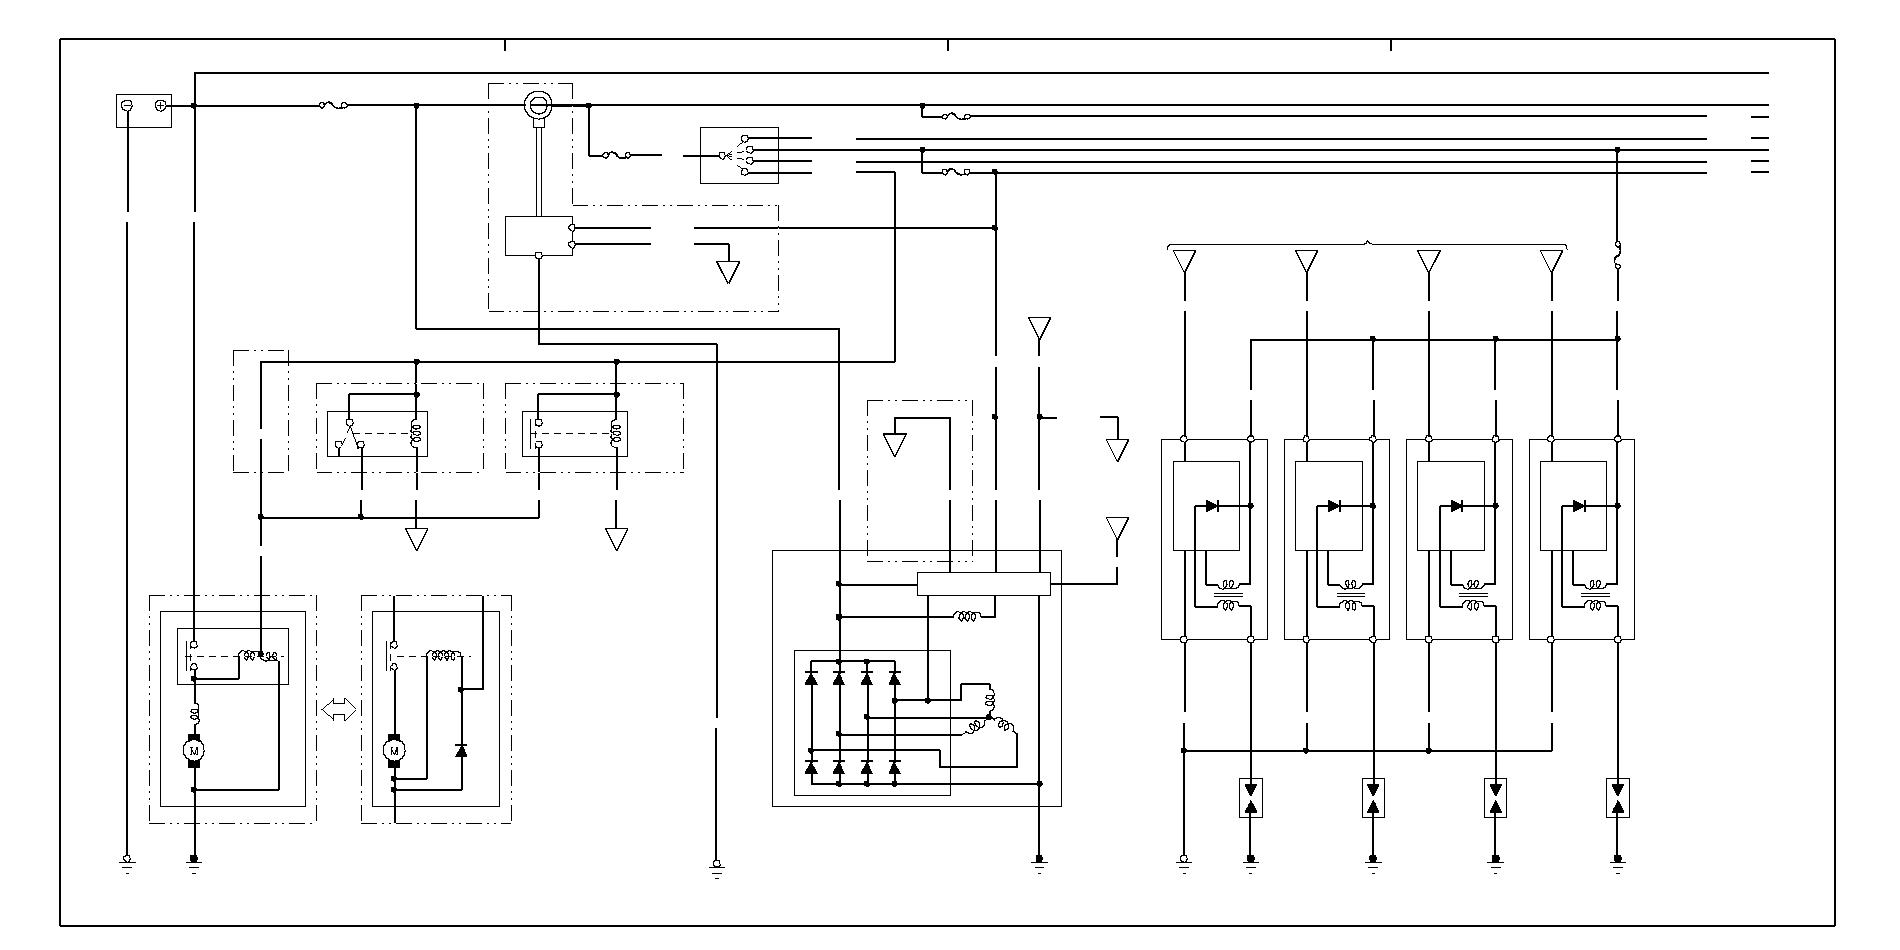 Cc1s Wiring Diagram